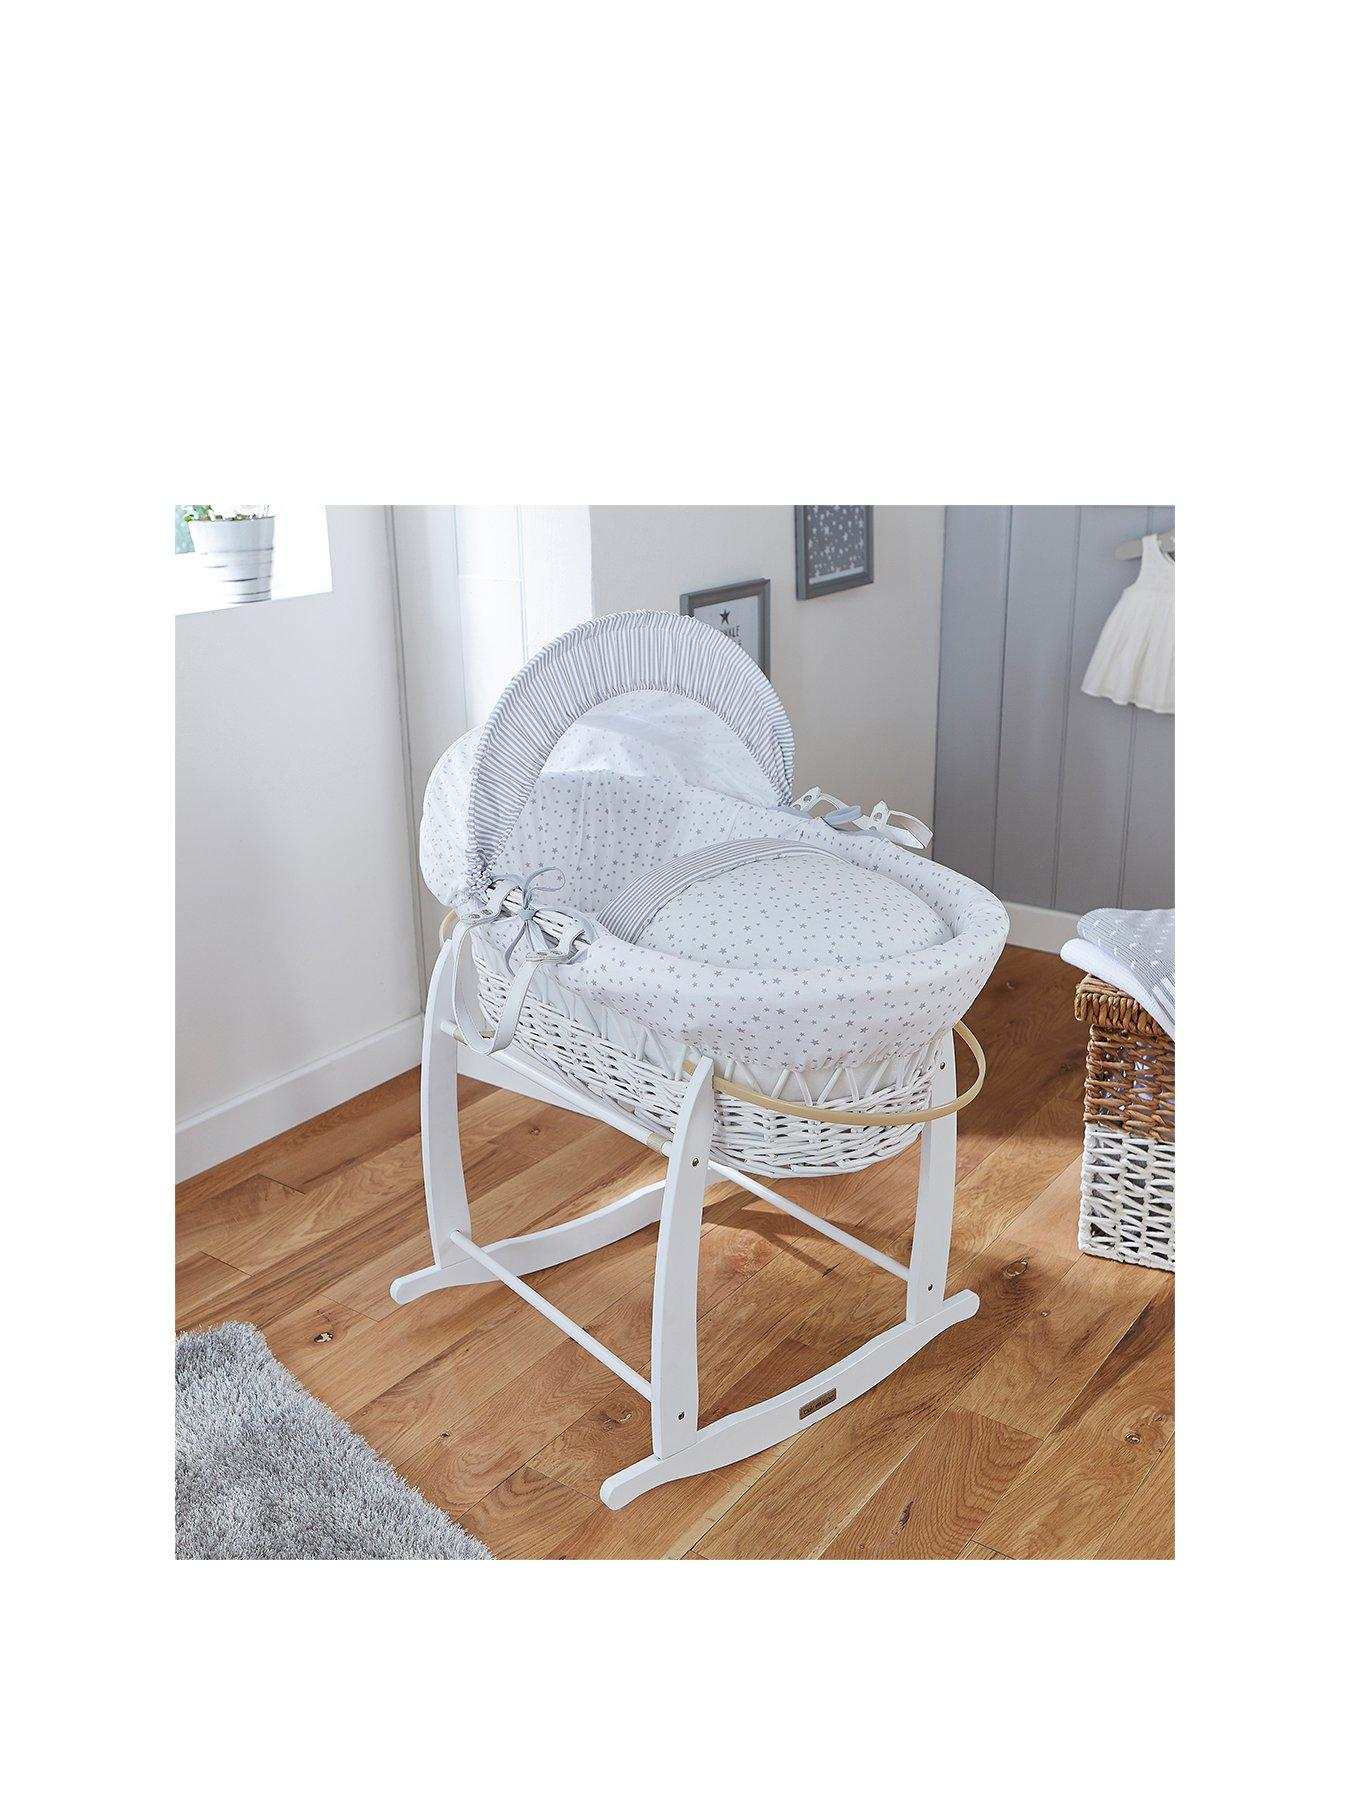 Baby Todler Breathable Mattress Fits NOAH POD Mosses Basket 74 x 28 cm